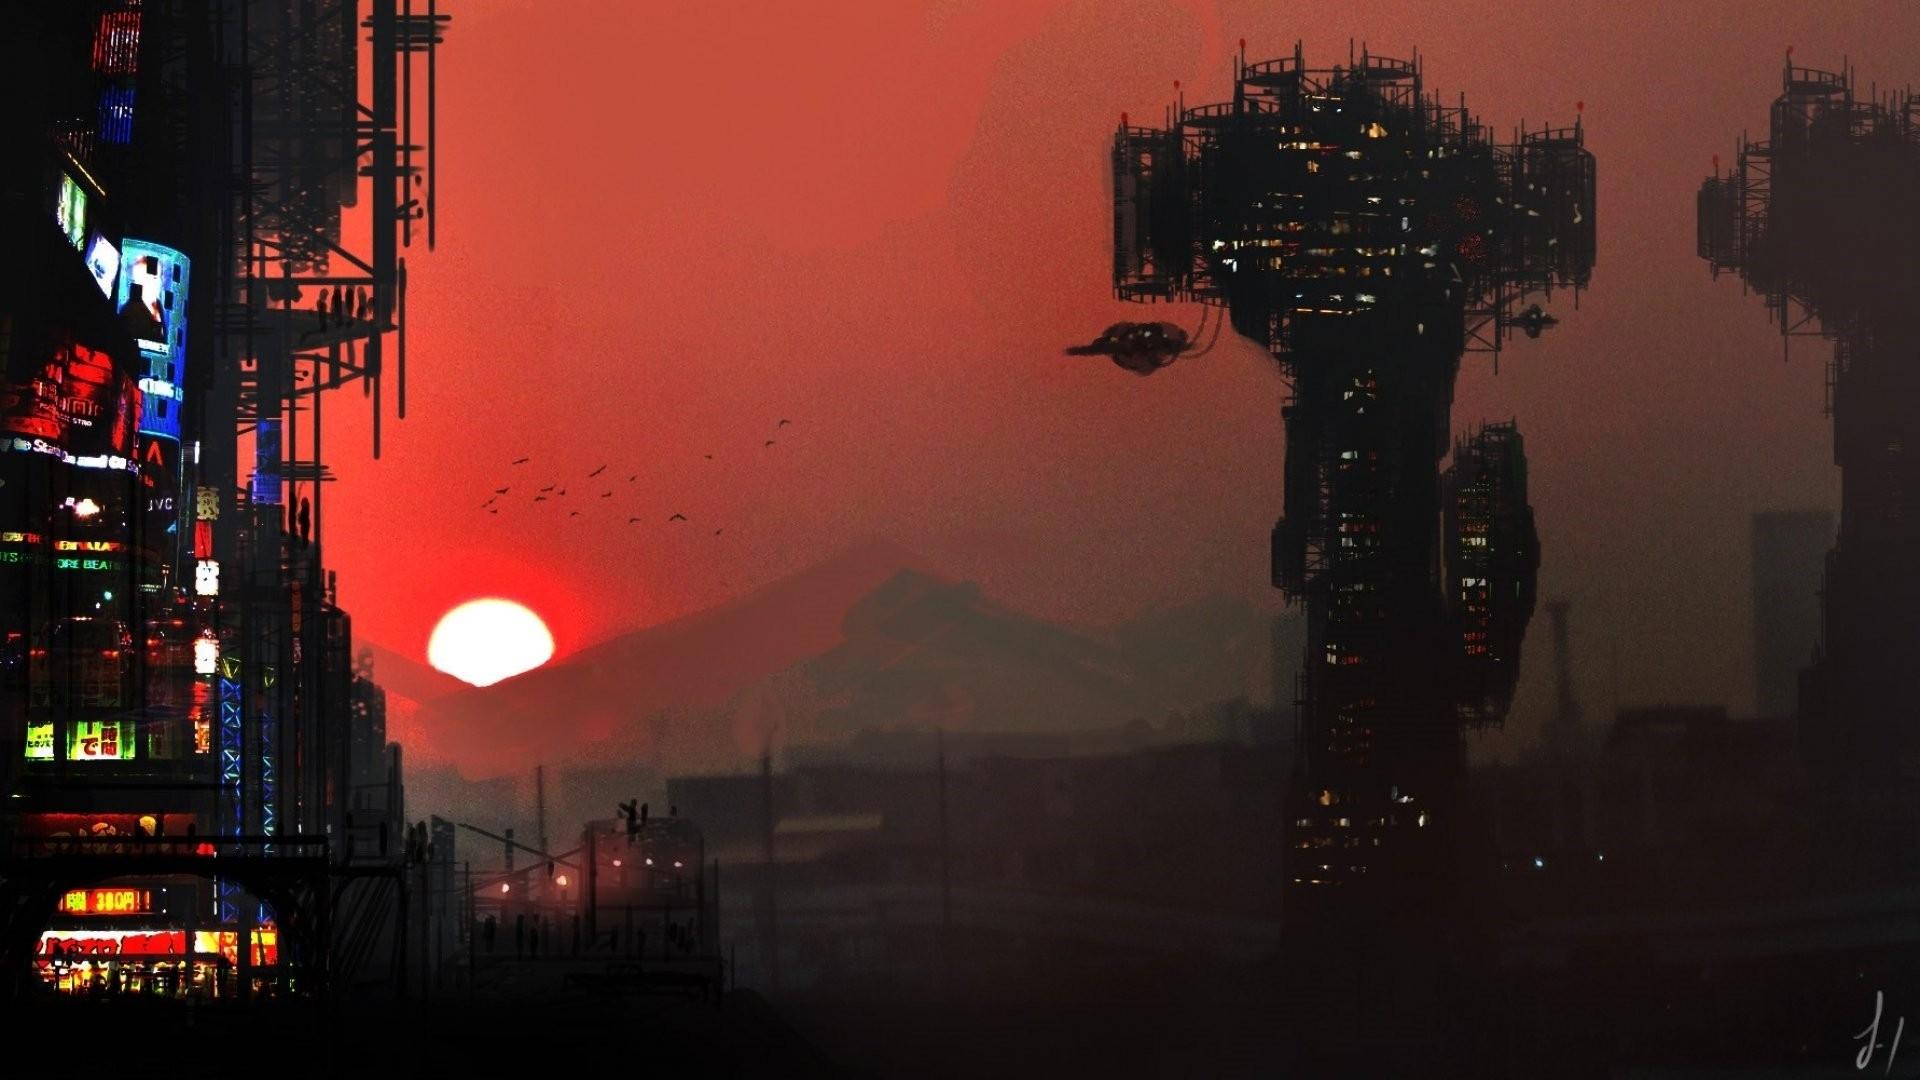 Cyberpunk City Art Pic